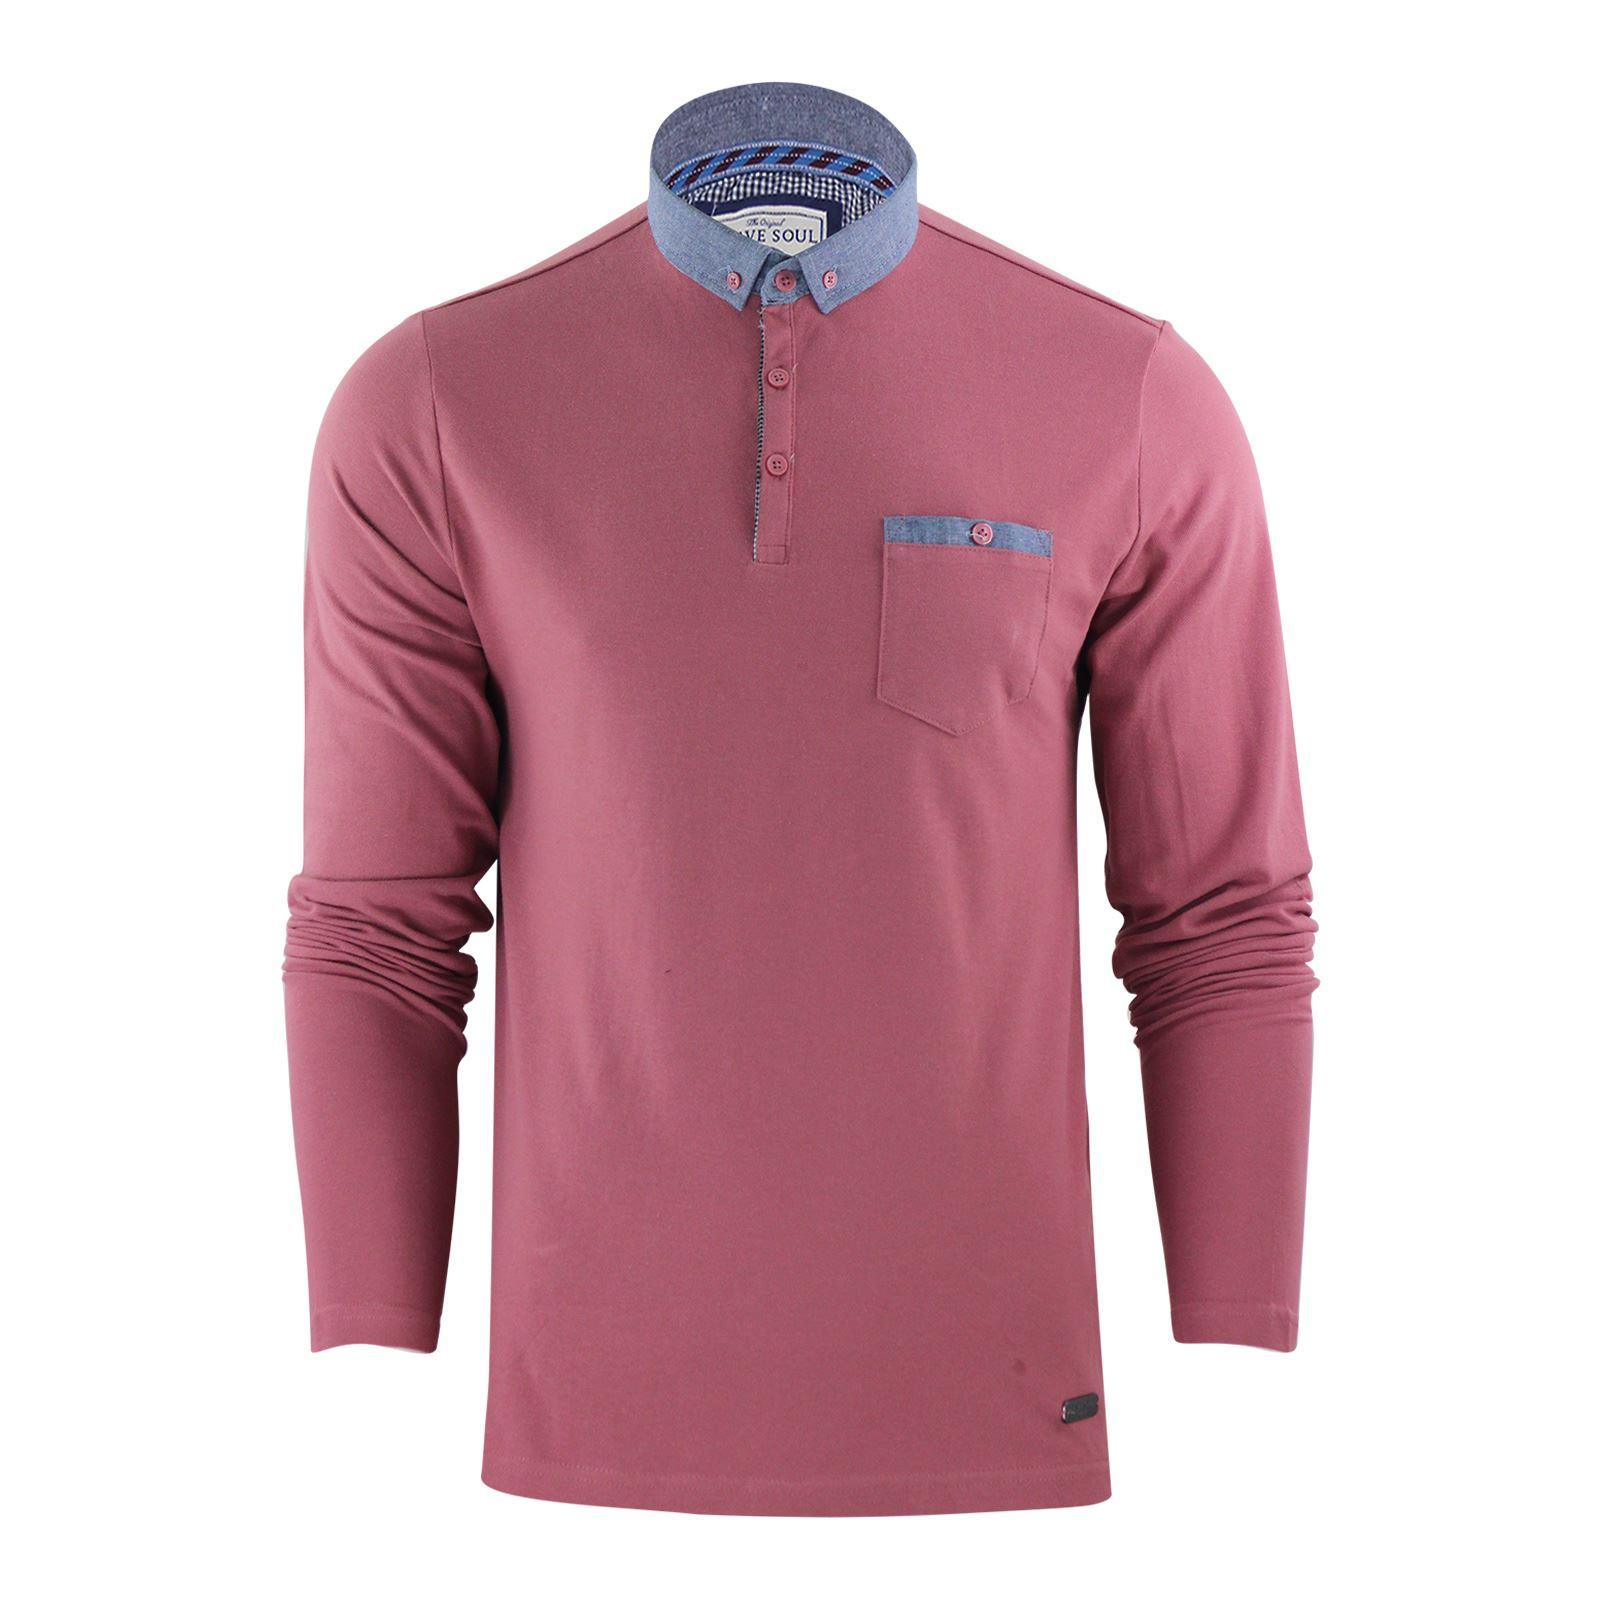 thumbnail 20 - Mens-Polo-T-Shirt-Brave-Soul-Hera-Cotton-Long-Sleeve-Casual-Top